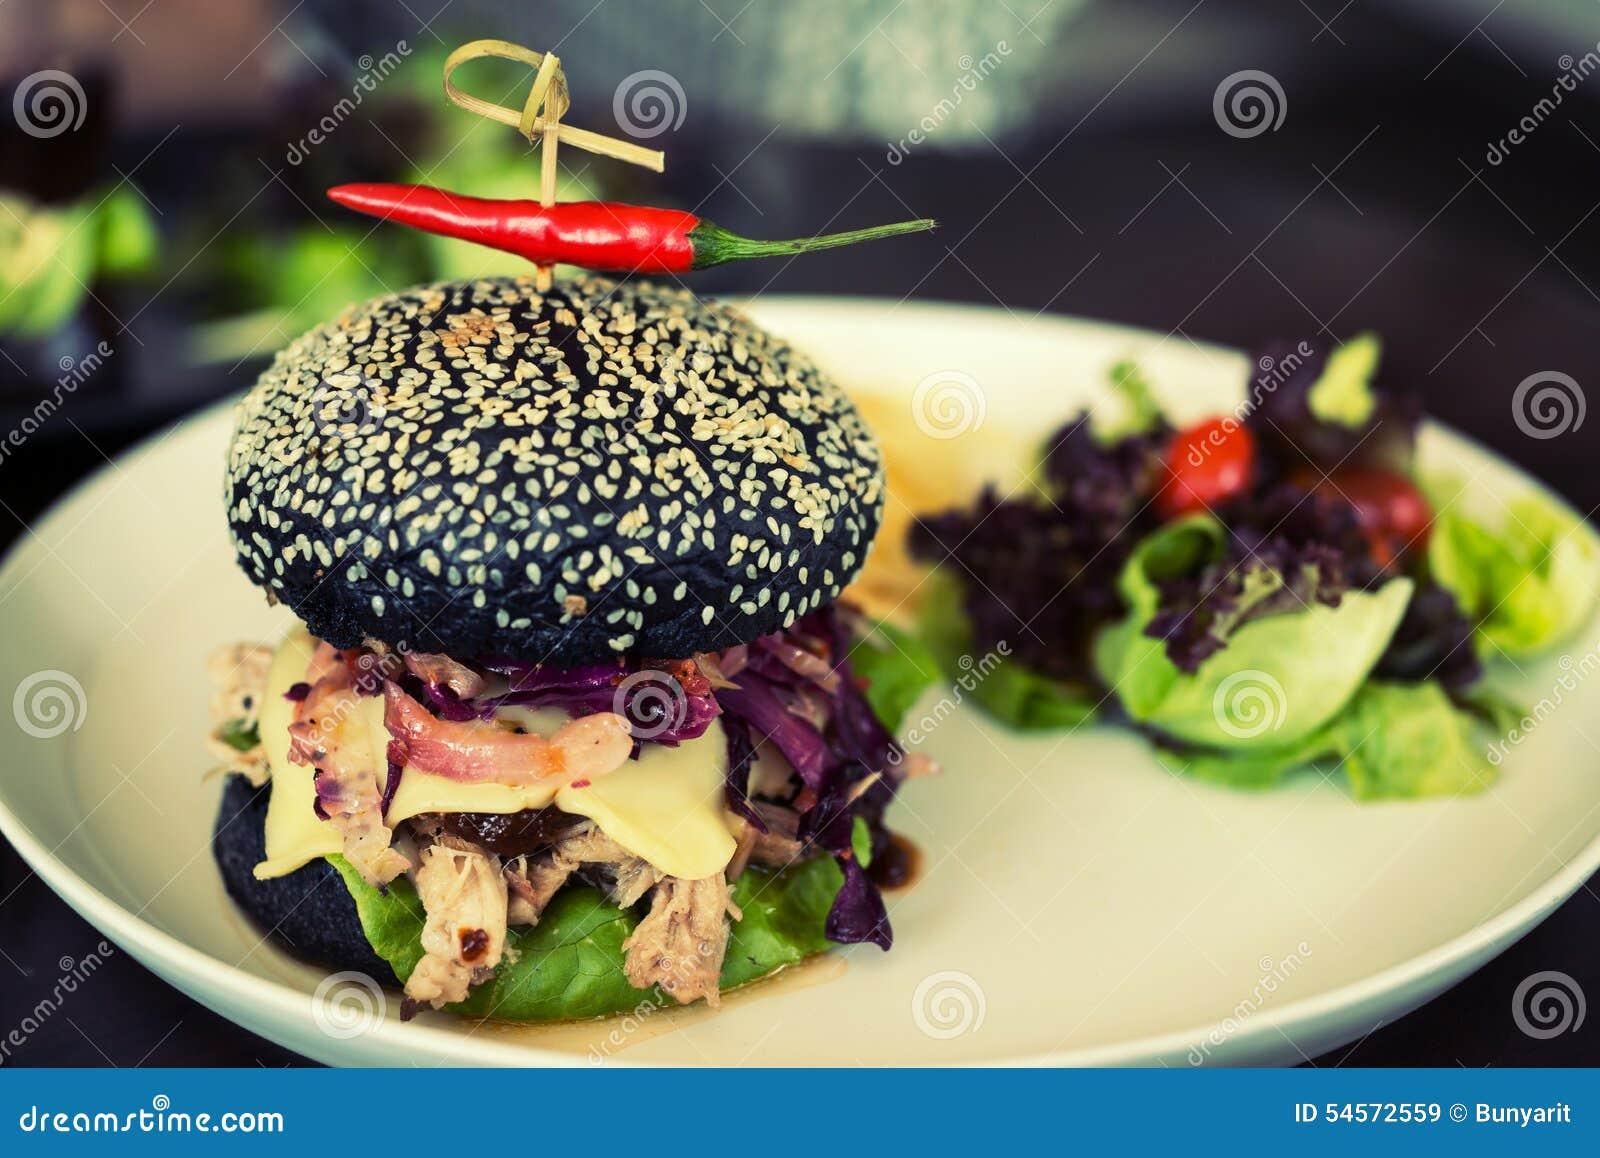 Hamburger Pork Made From Bread Breeze Yacht Mixing Bamboo Charc - Black hamburger